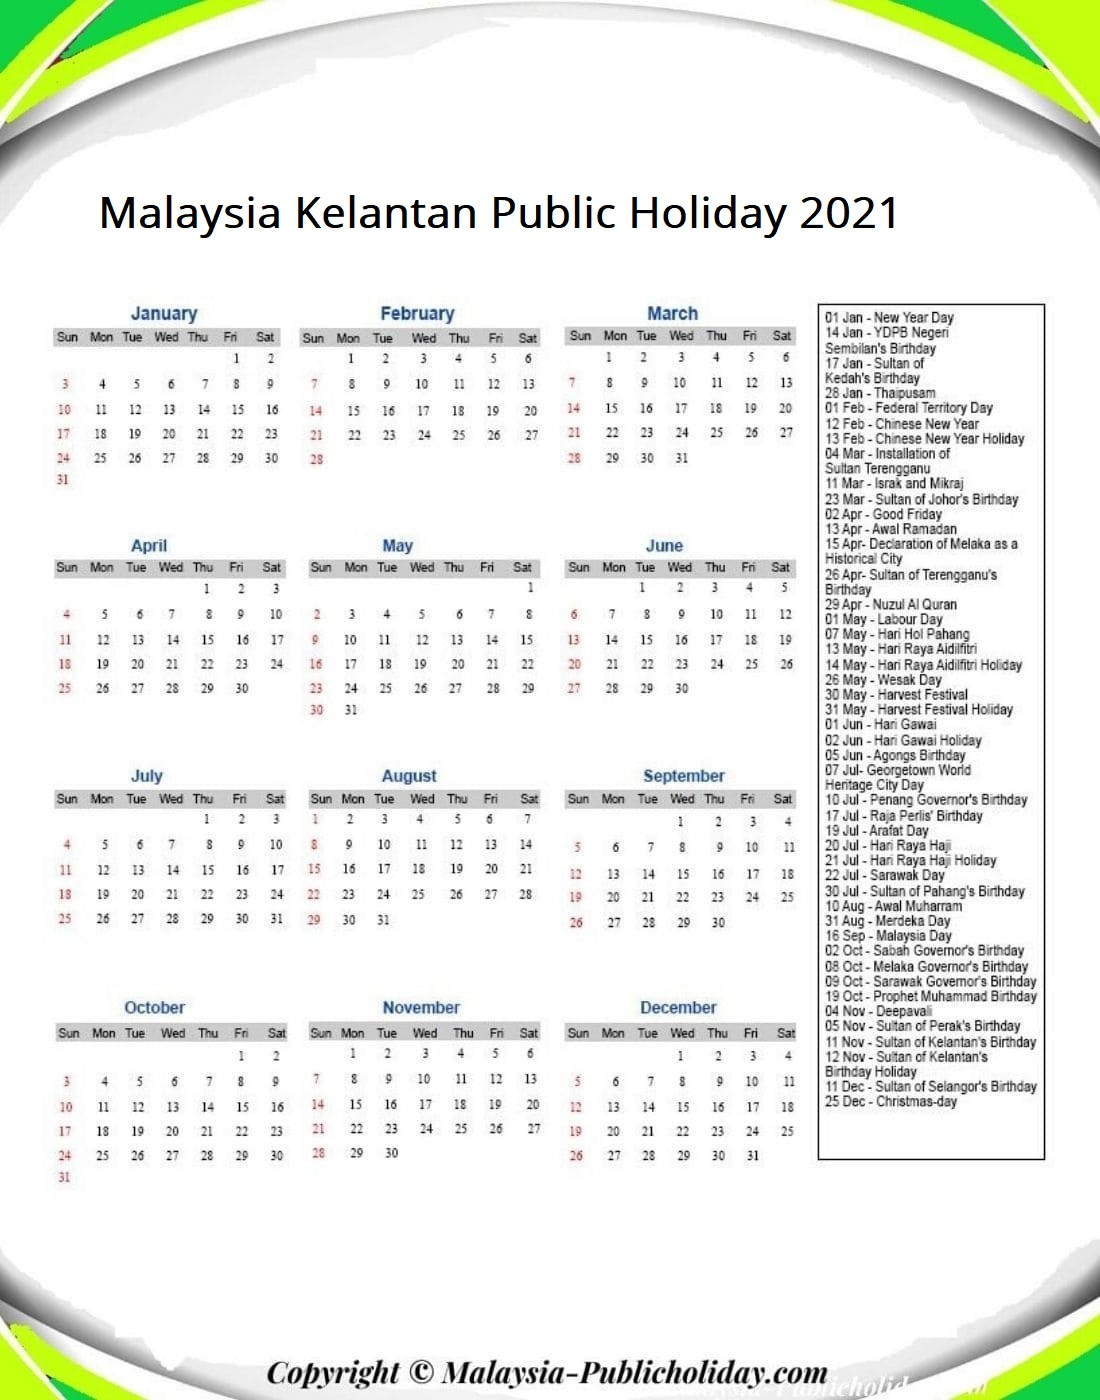 Kelantan Calendars with Holidays 2021